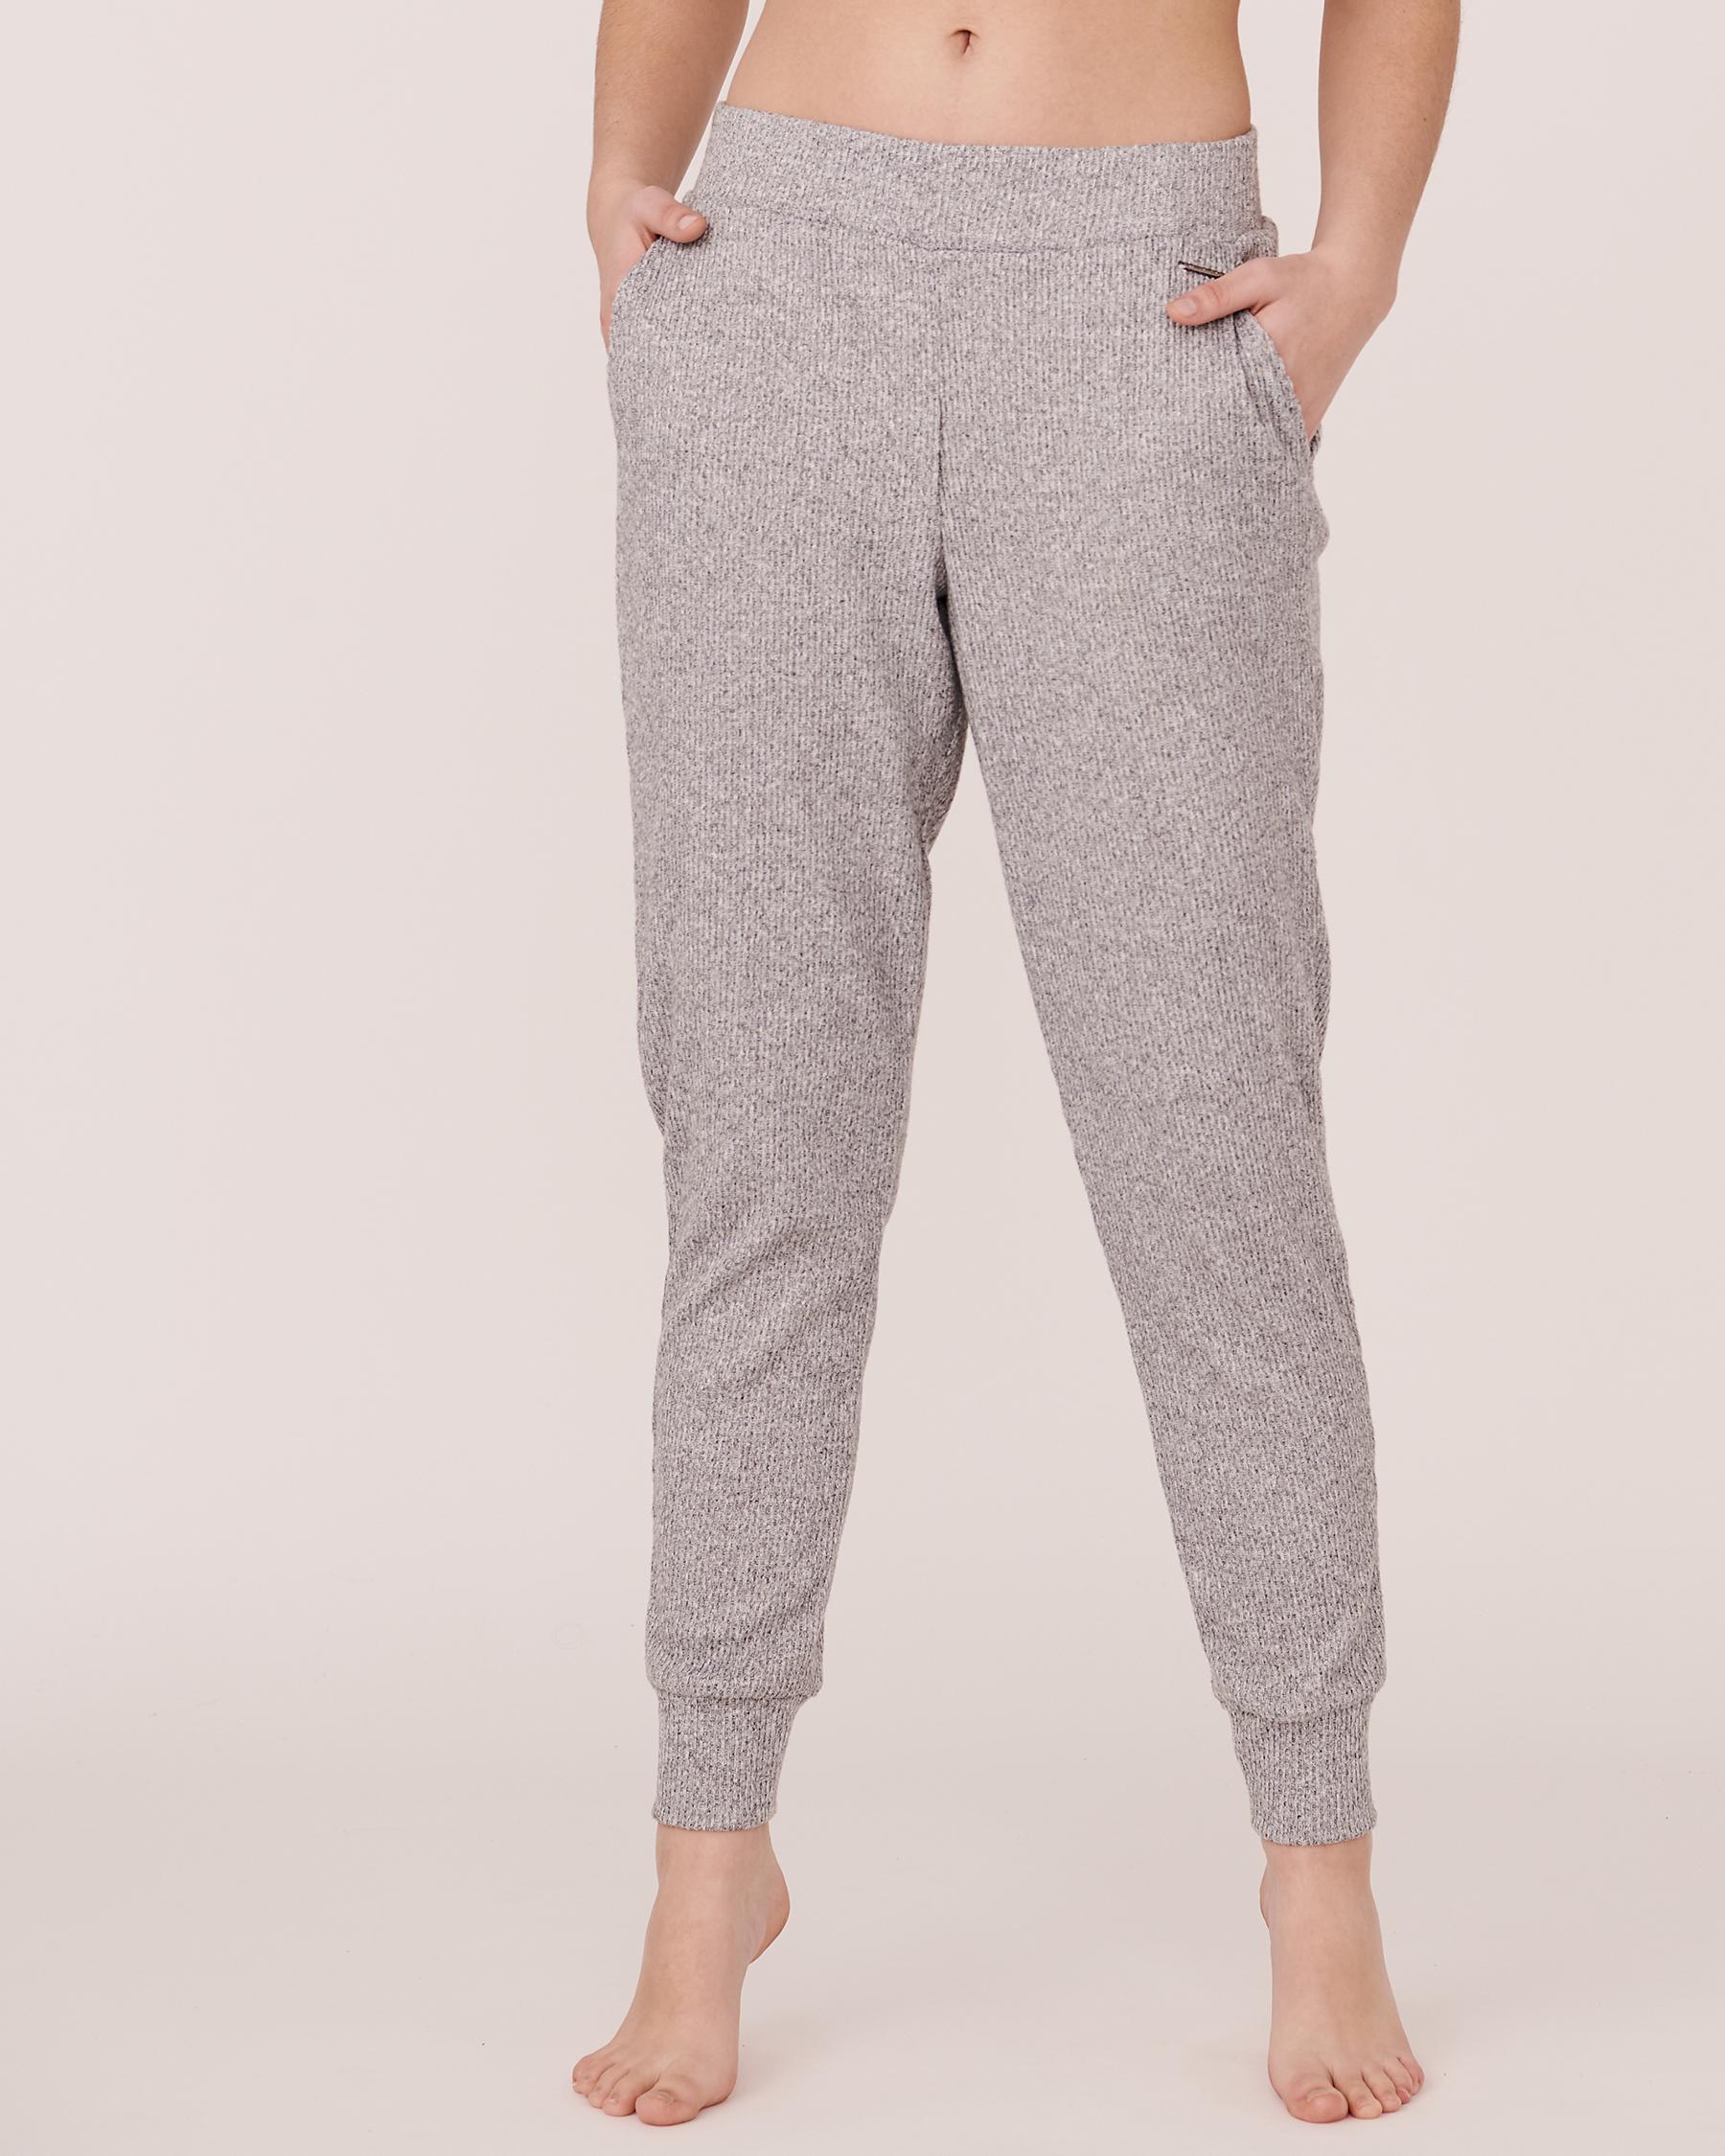 LA VIE EN ROSE Elastic Waistband Ribbed Pant Grey 774-476-0-04 - View1